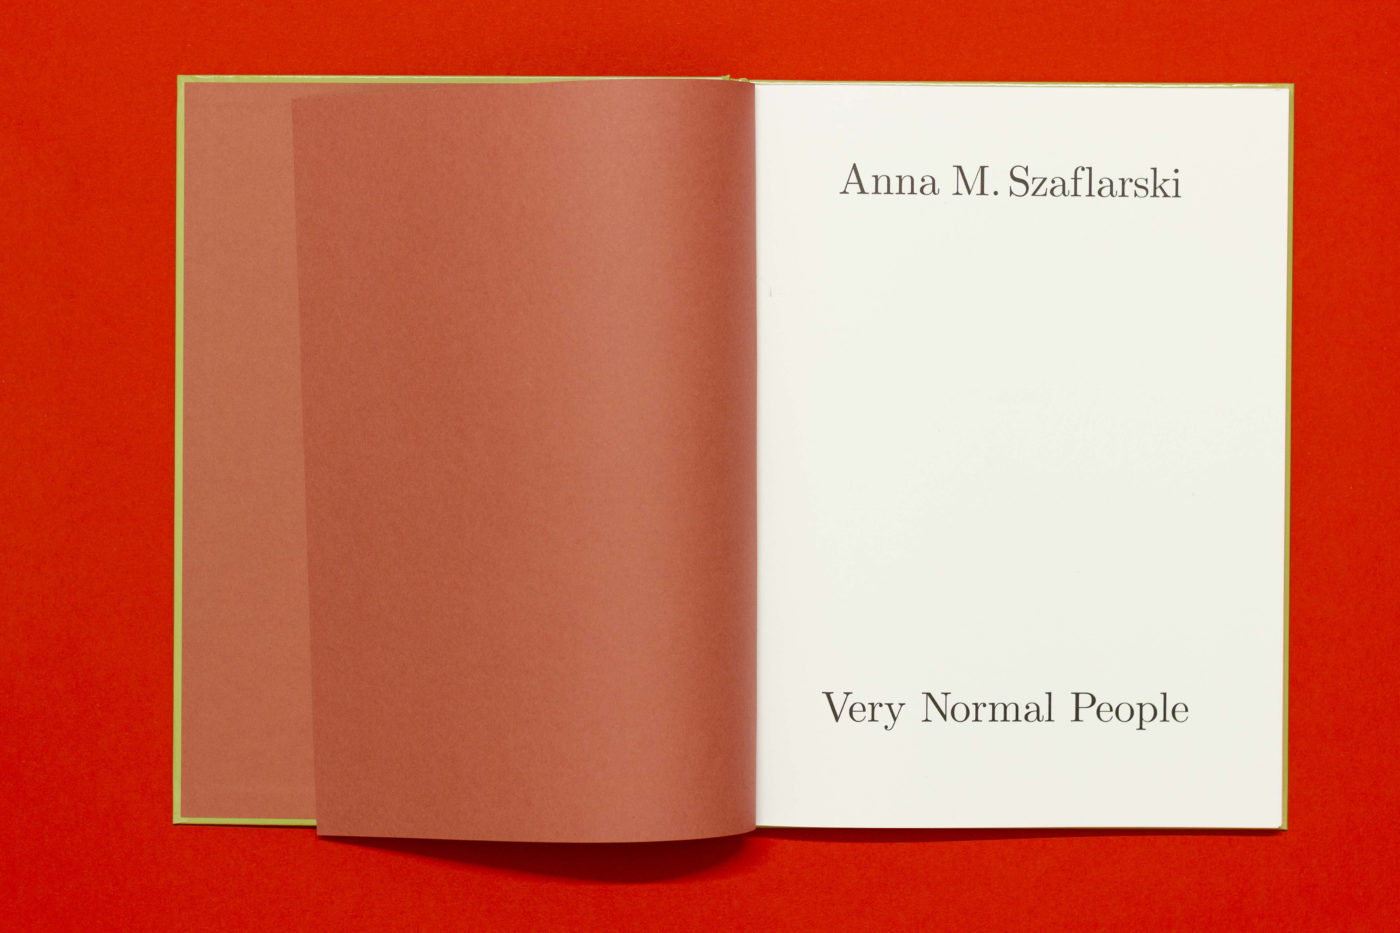 Anna M. Szaflarski Very Normal People